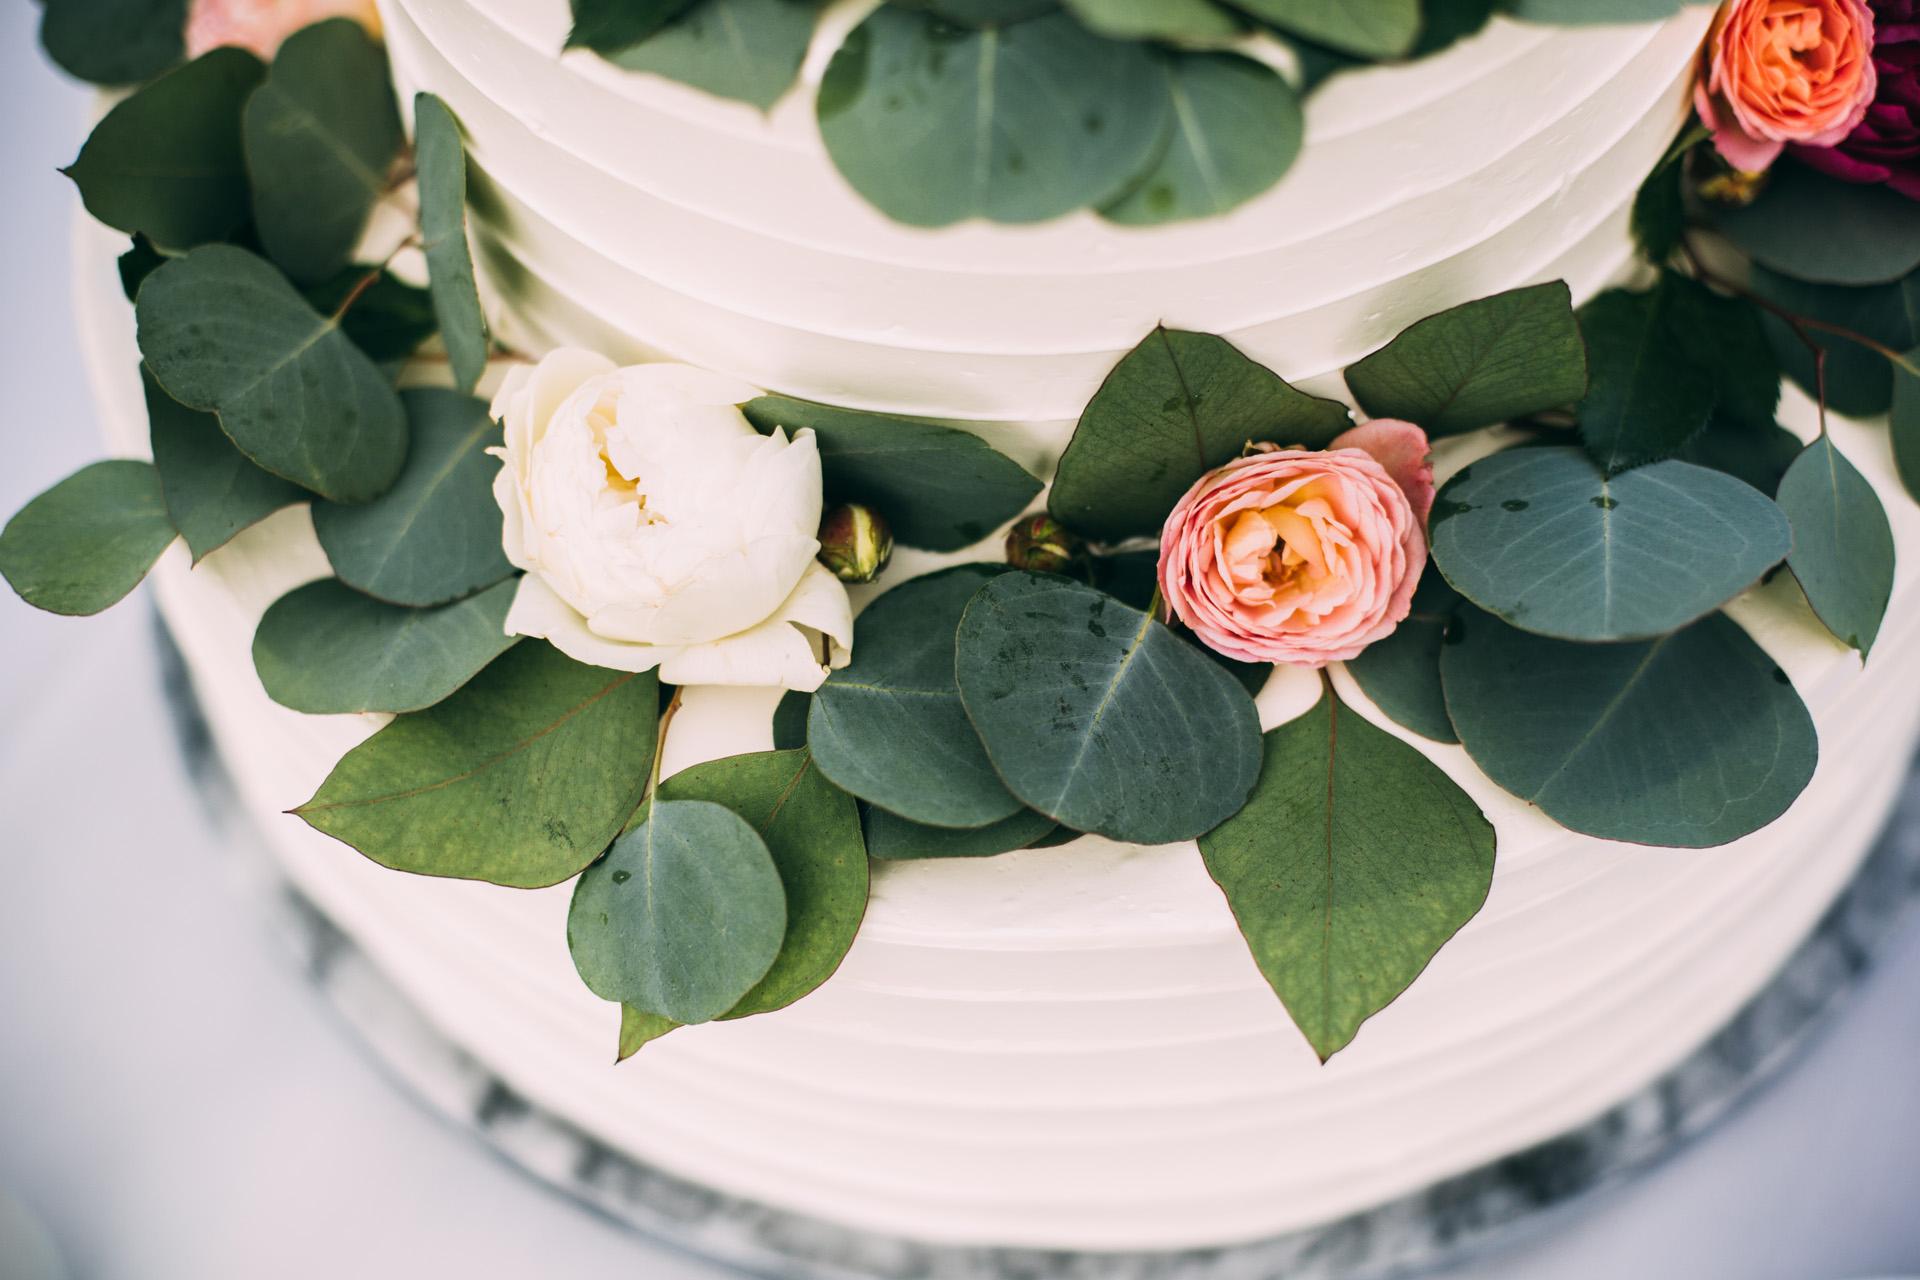 woodstock-inn-vermont-wedding-21